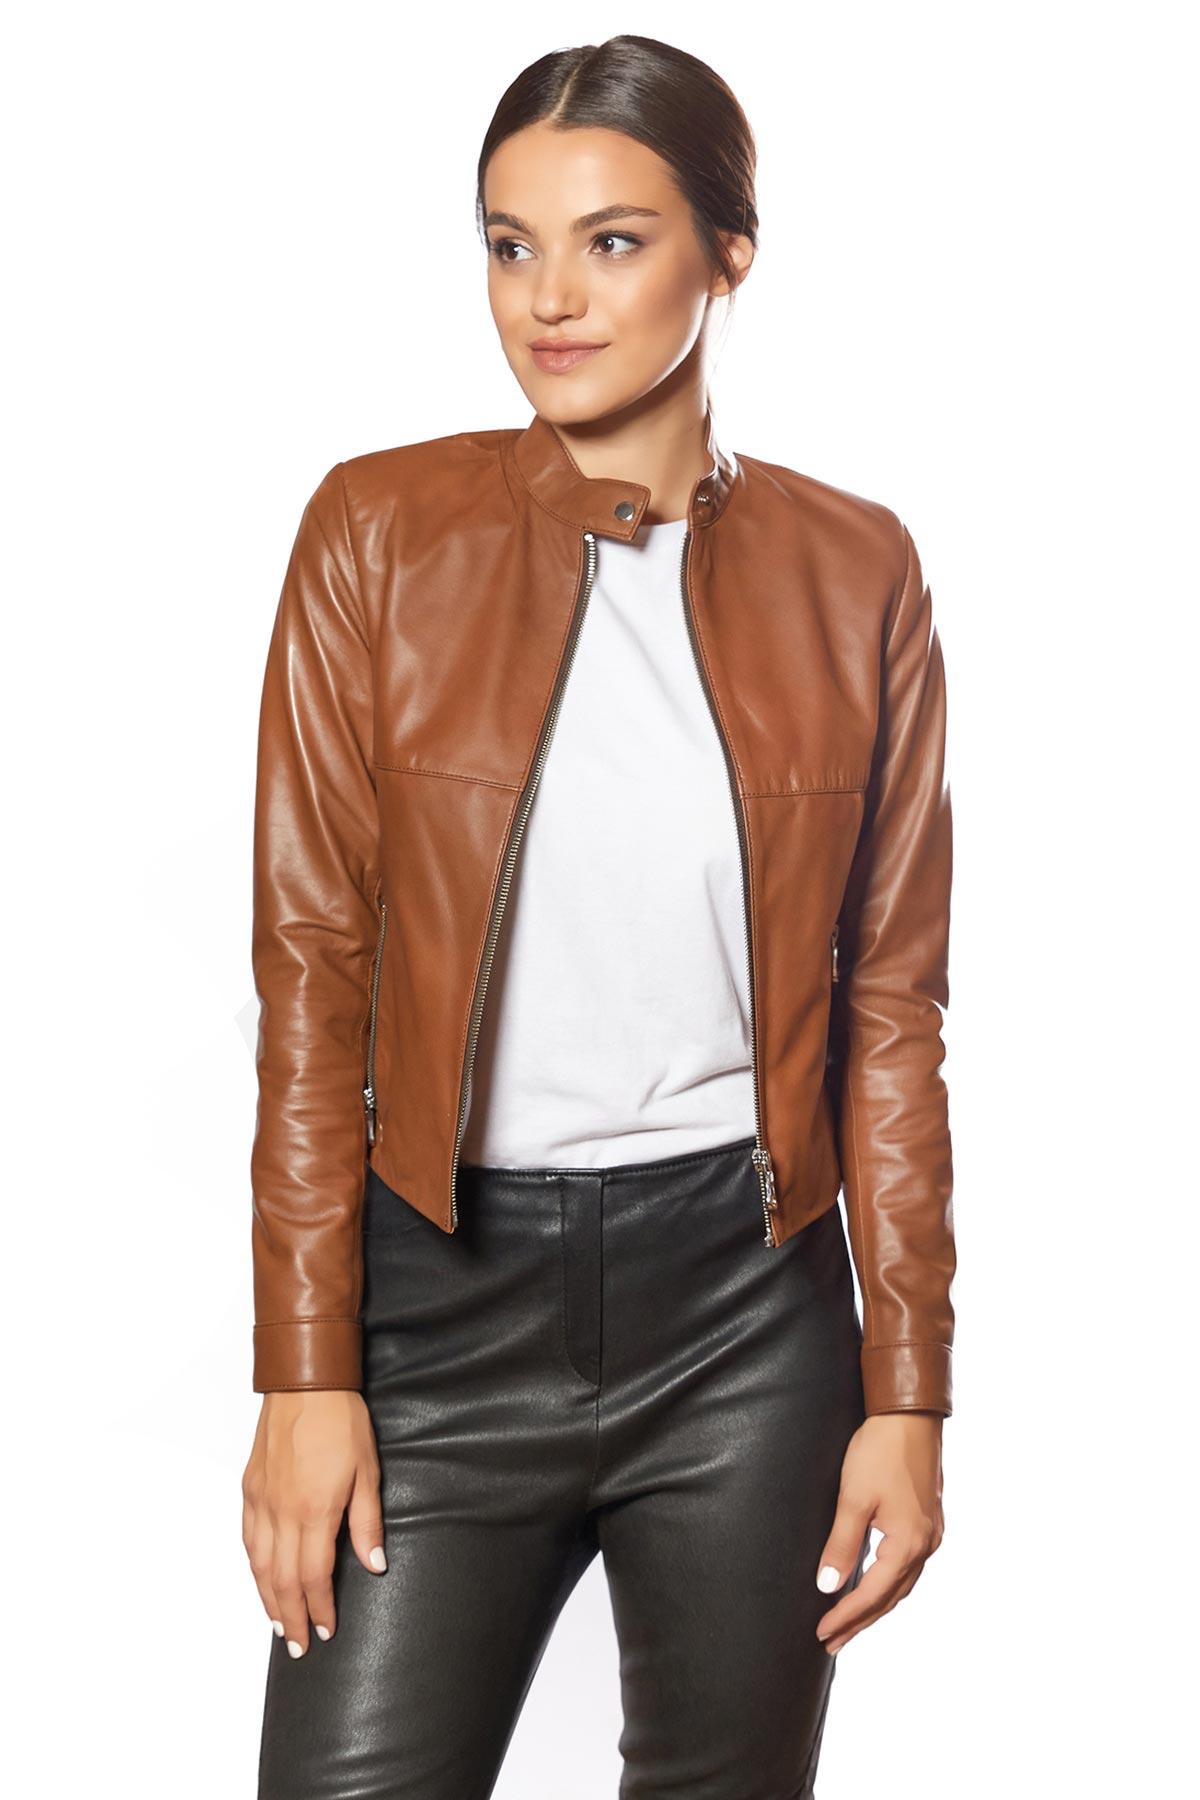 custom leather jackets nyc